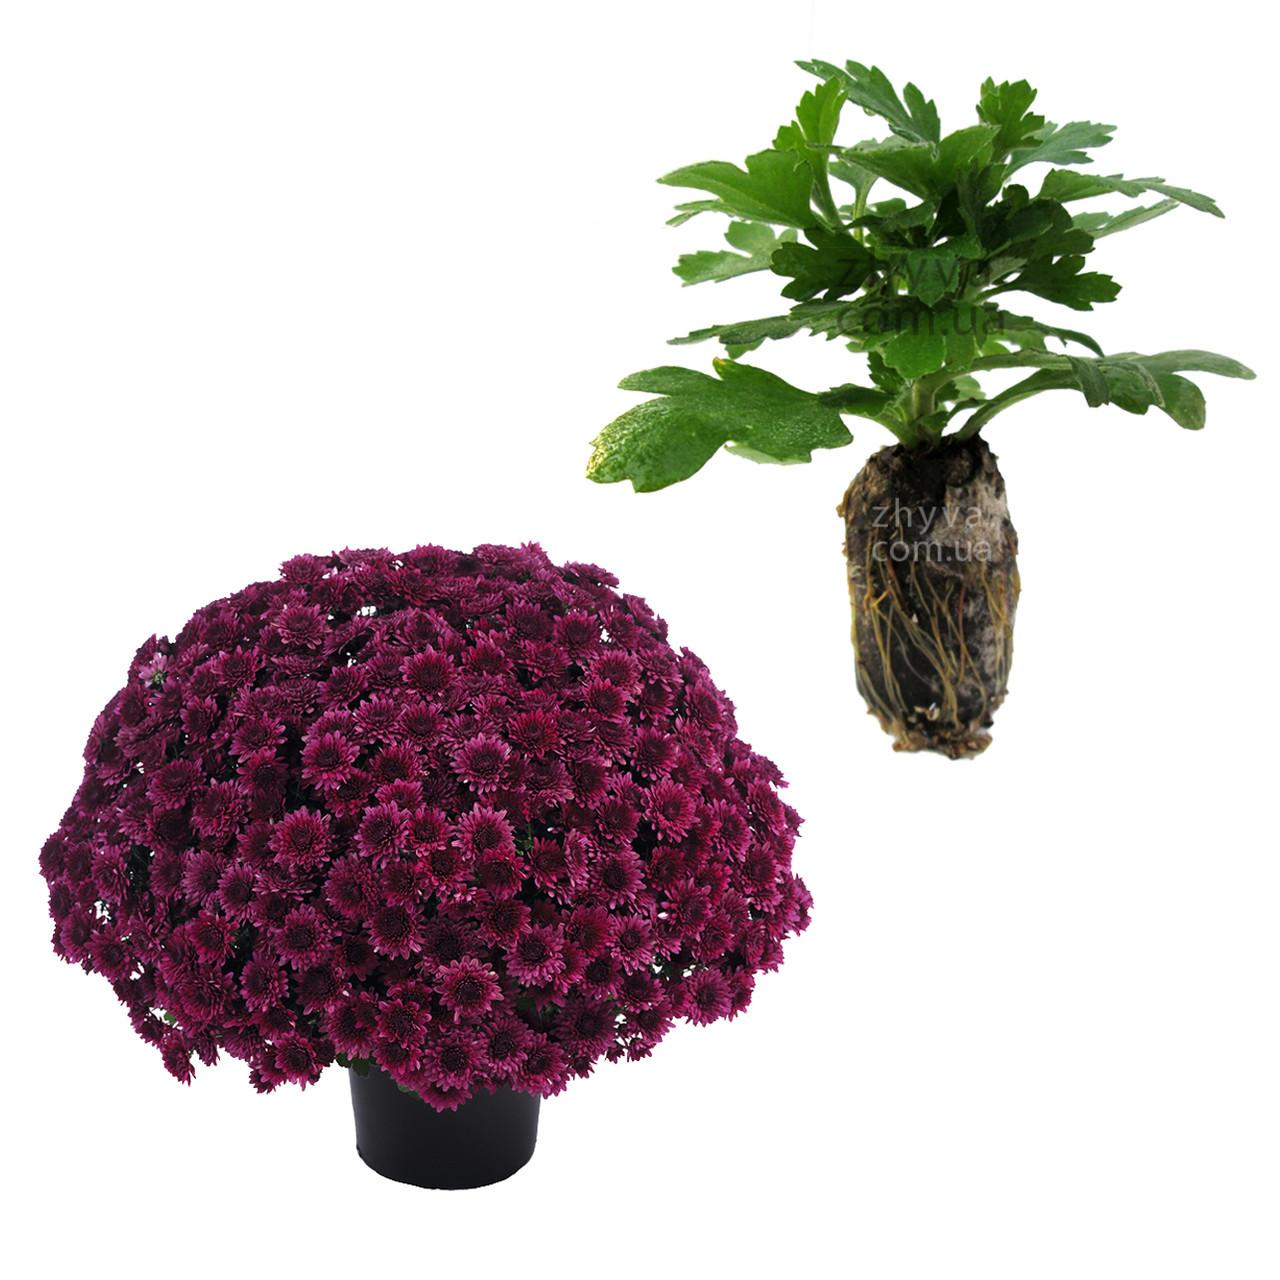 "Саджанці Хризантема Multiflora ""Avalon Purple'' 1шт / Рассада Хризантема Multiflora ""Avalon Purple''"